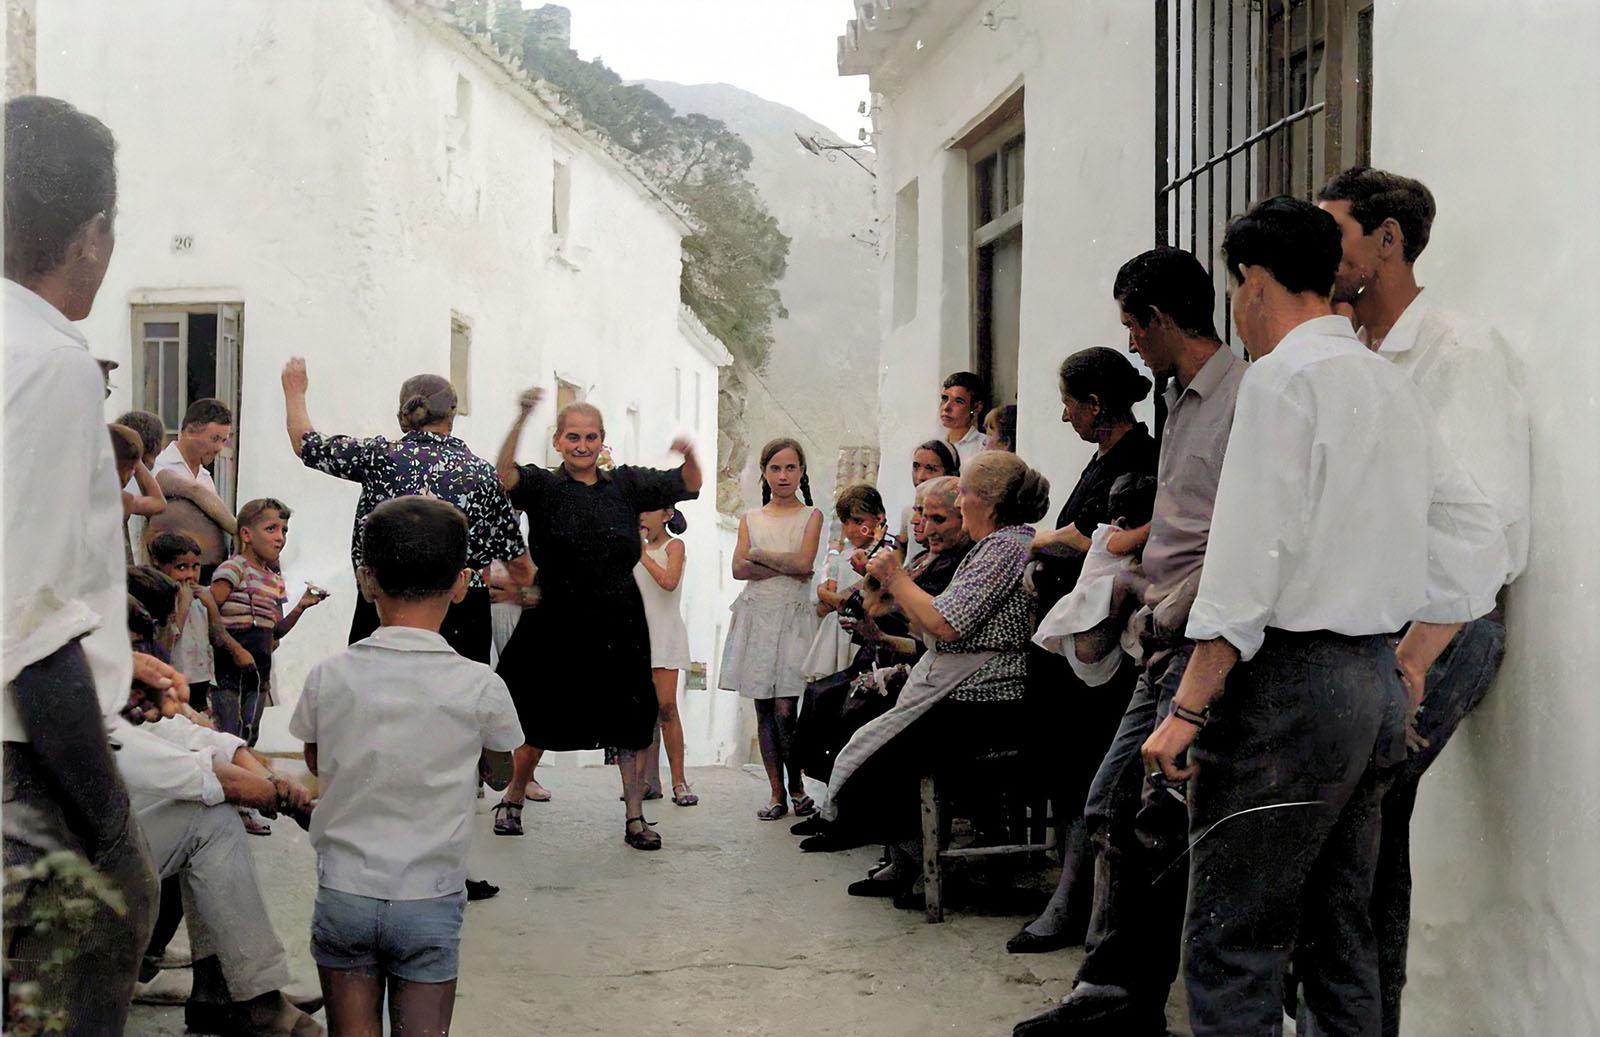 Fotografía: Baile de fandango casareño (Archivo Franchesca Ledesma Lazo)